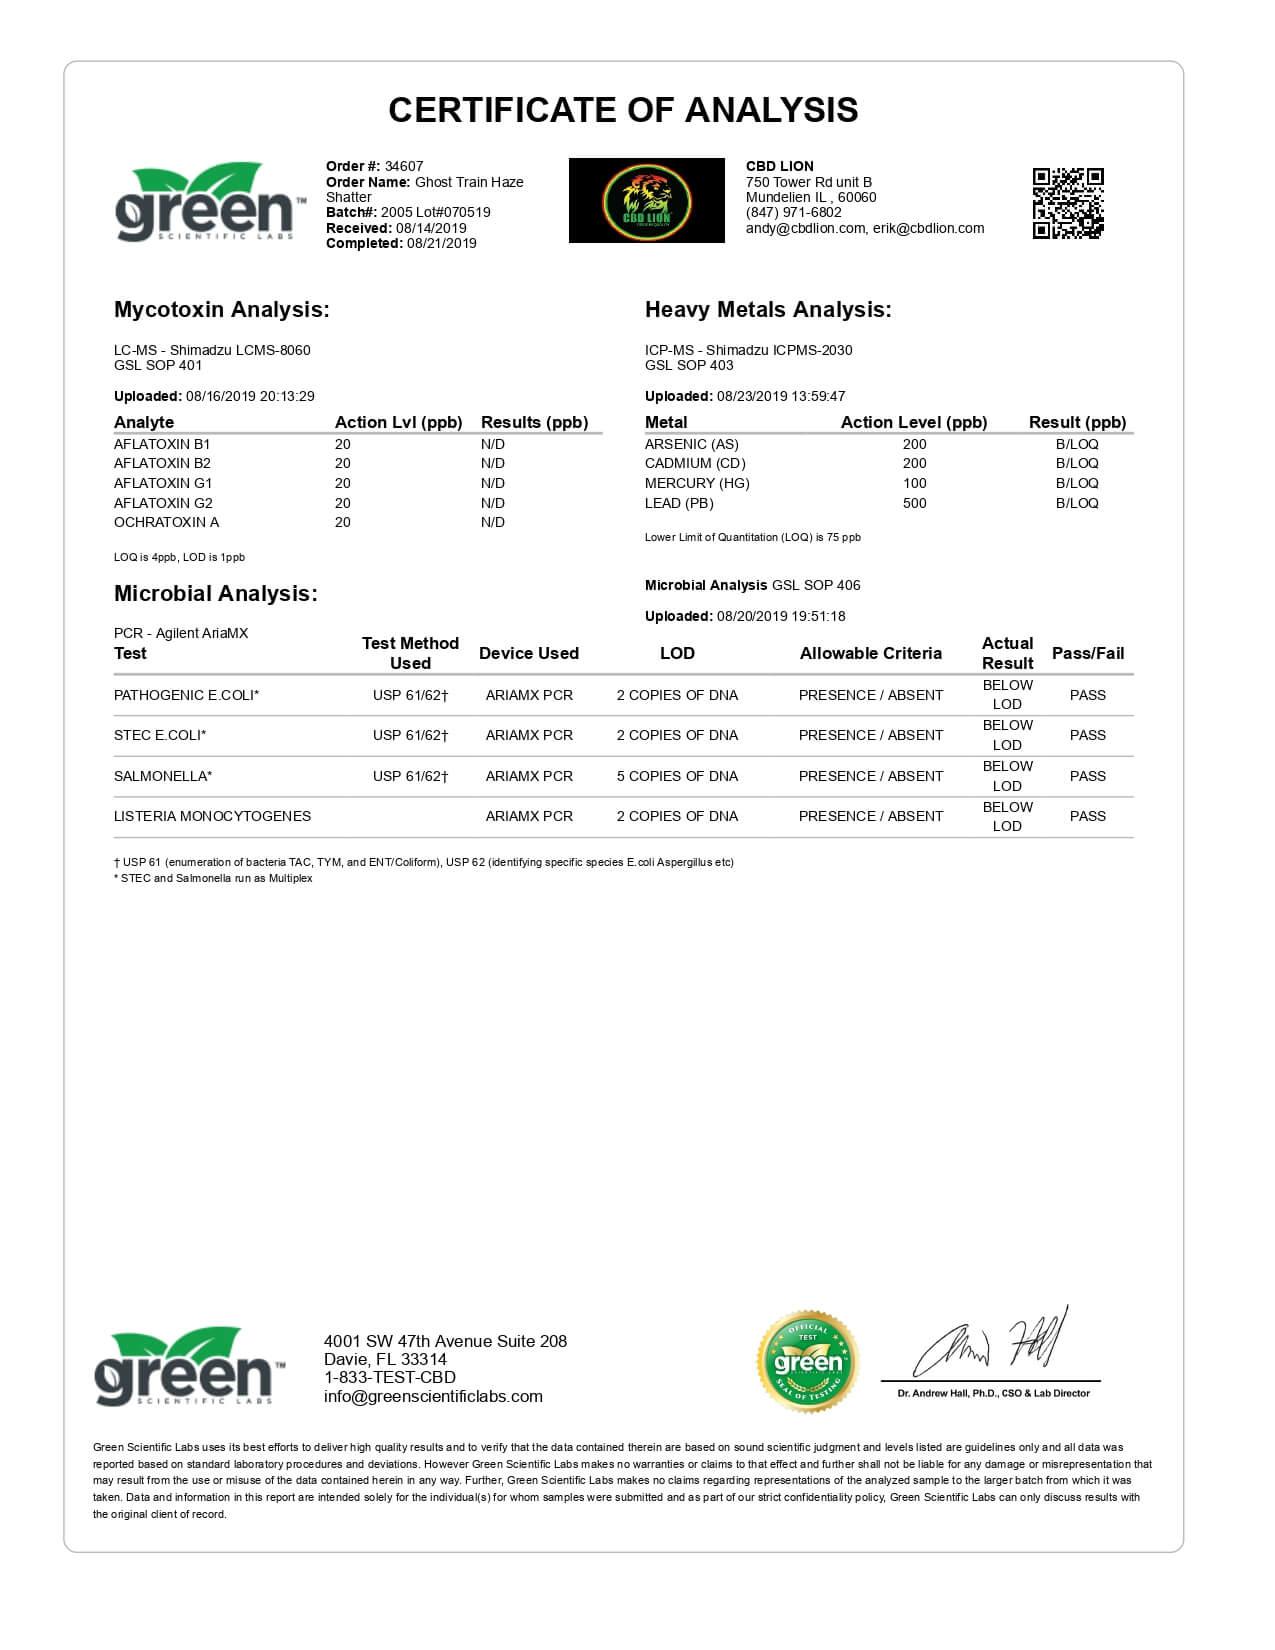 CBD Lion CBD Concentrate Ghost Train Haze Shatter 1g Lab Report